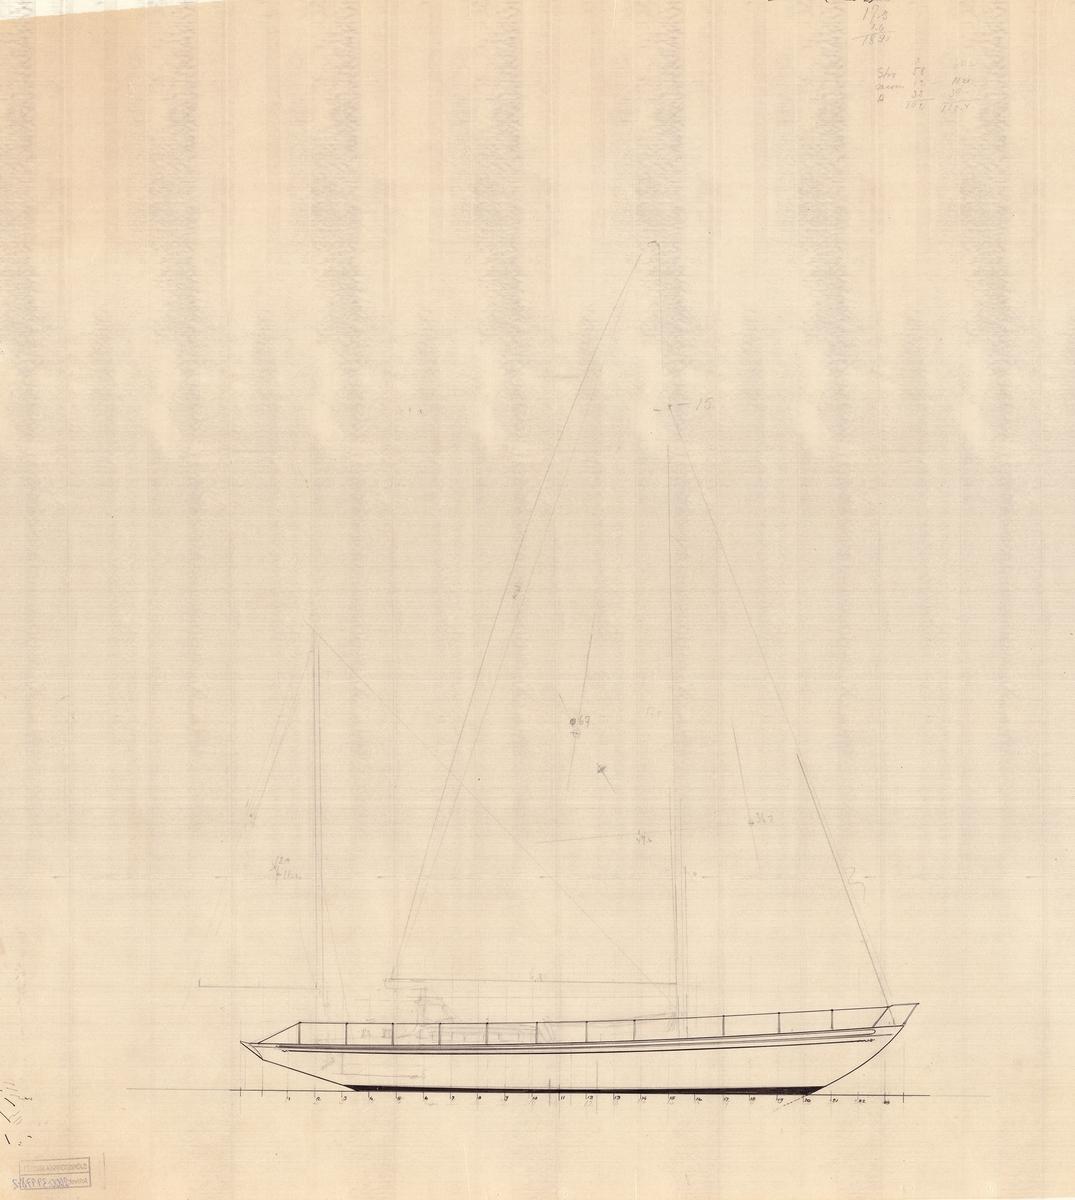 Skiss, segelritning